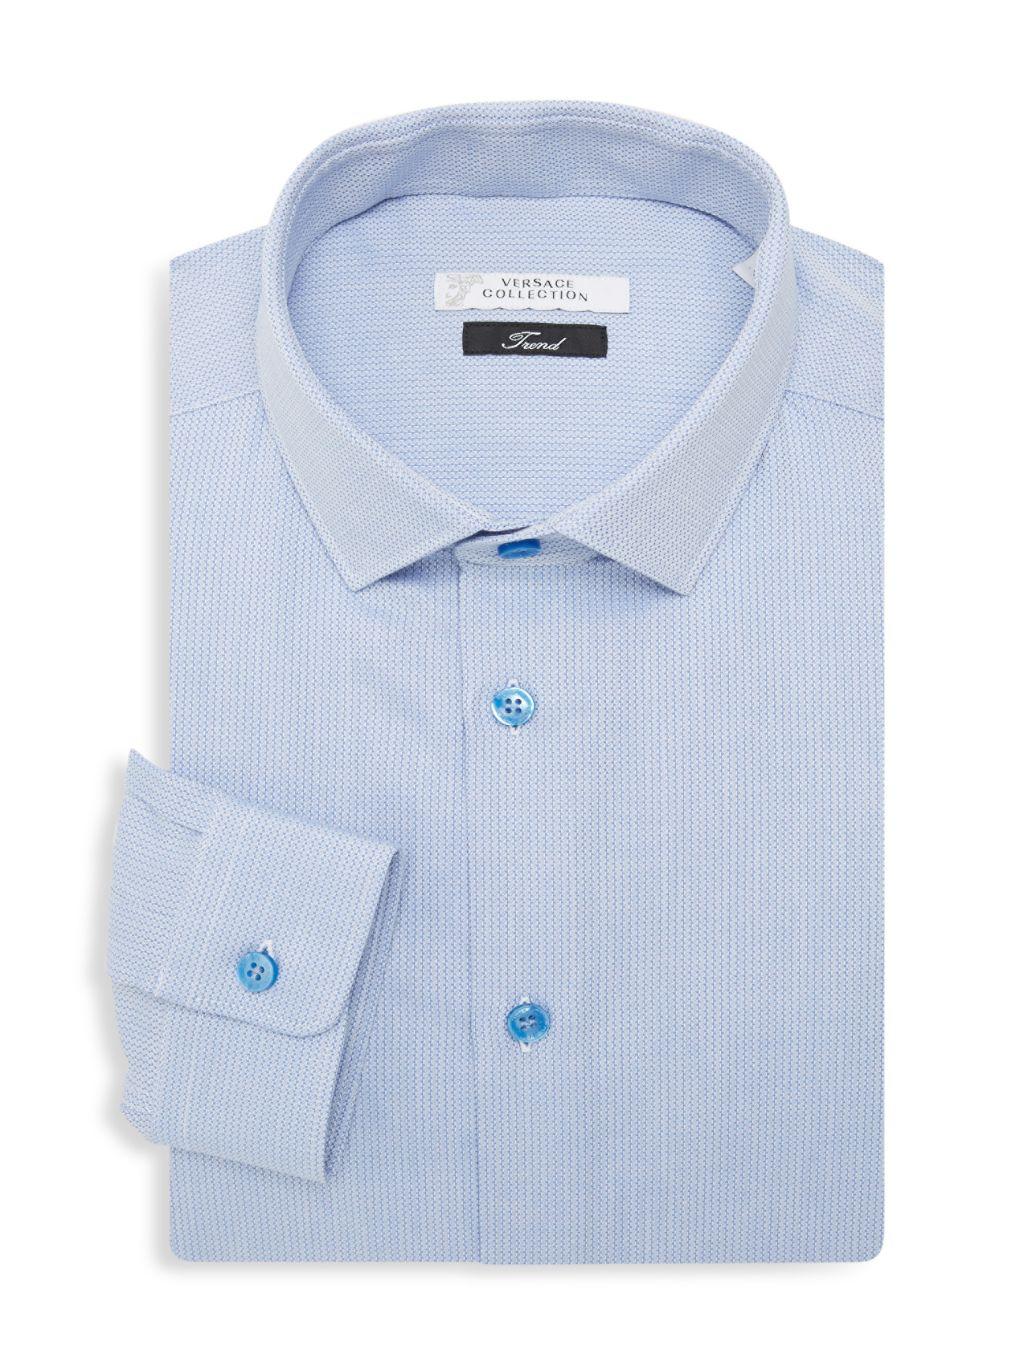 Versace Collection Trend Fit Textured Dress Shirt